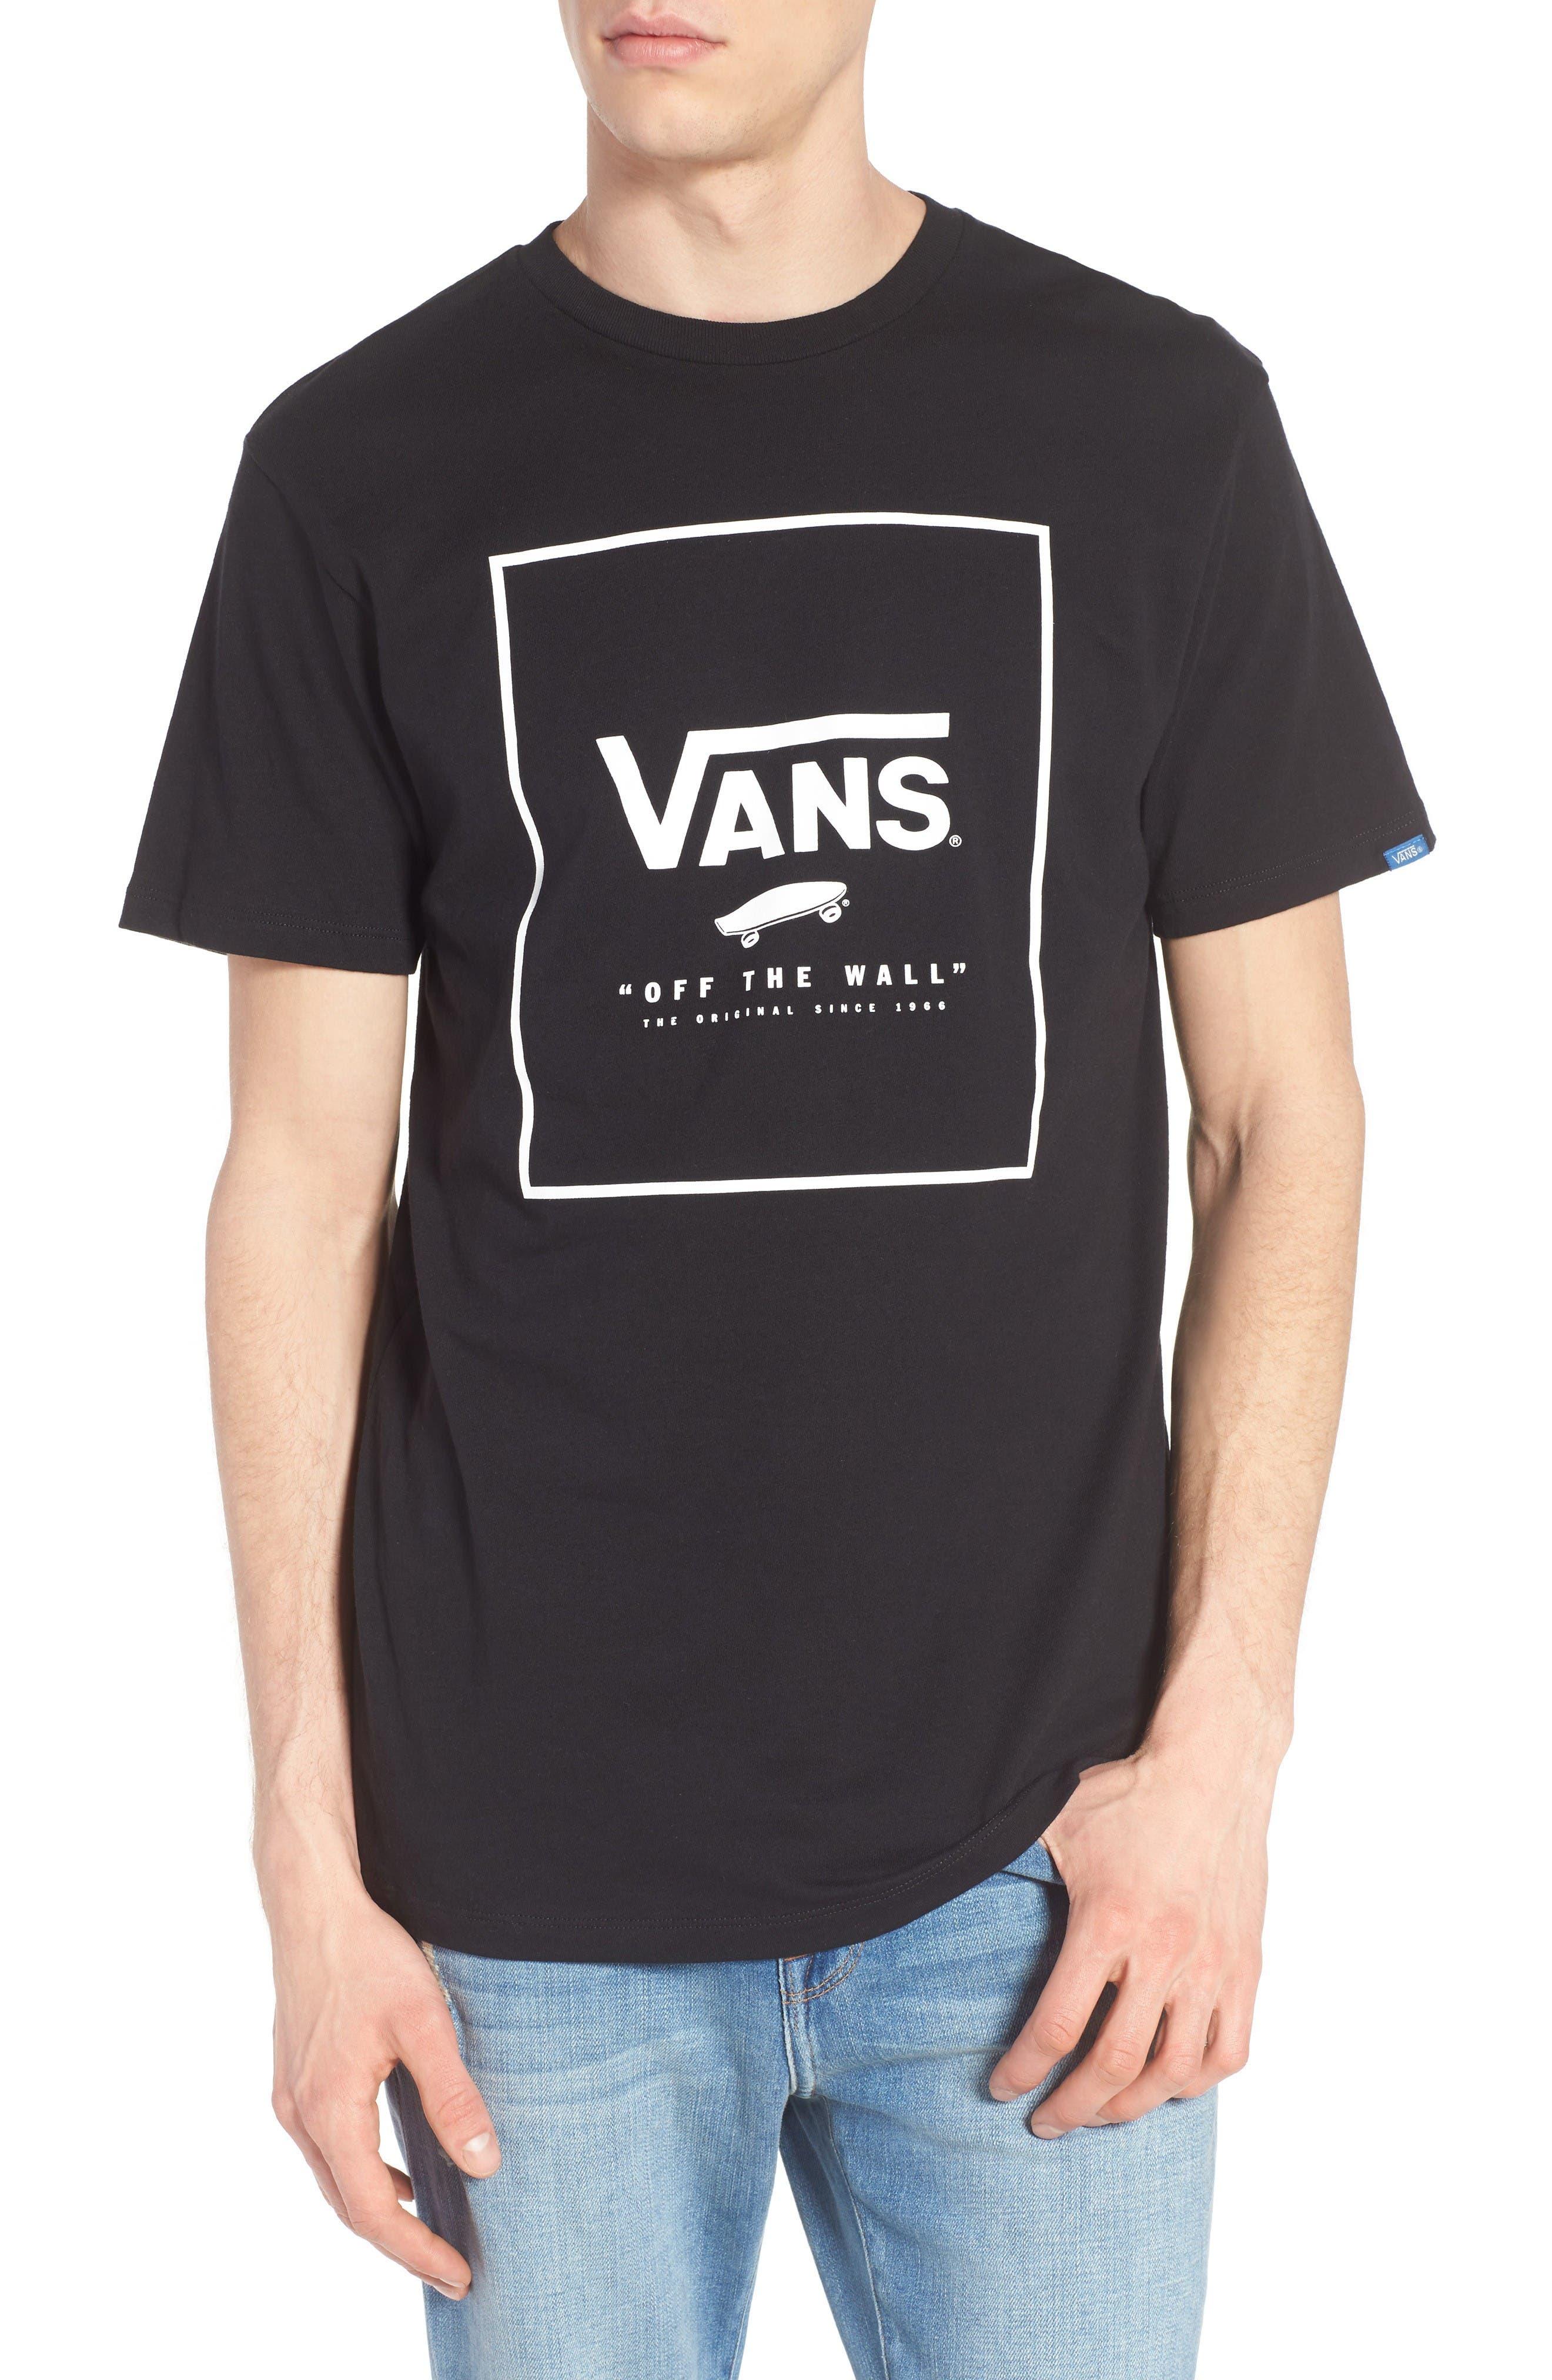 Vans Box Graphic T-Shirt